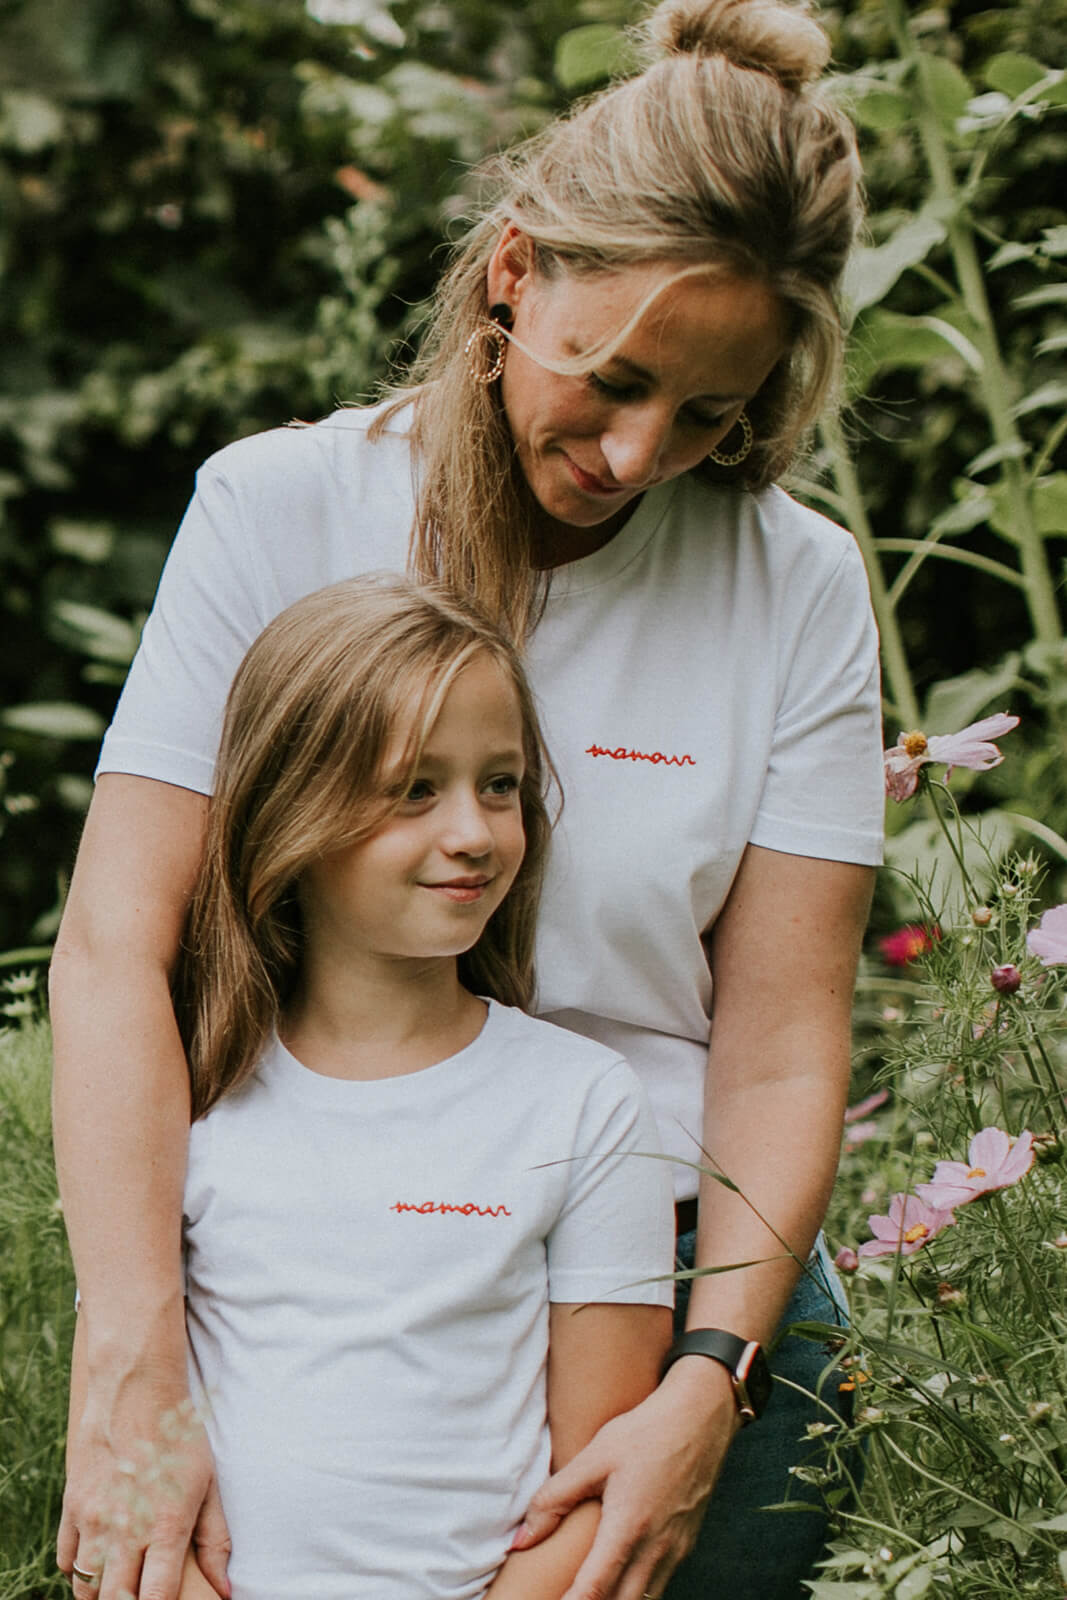 Mamour t-shirt kids & dames - Mangos on Monday